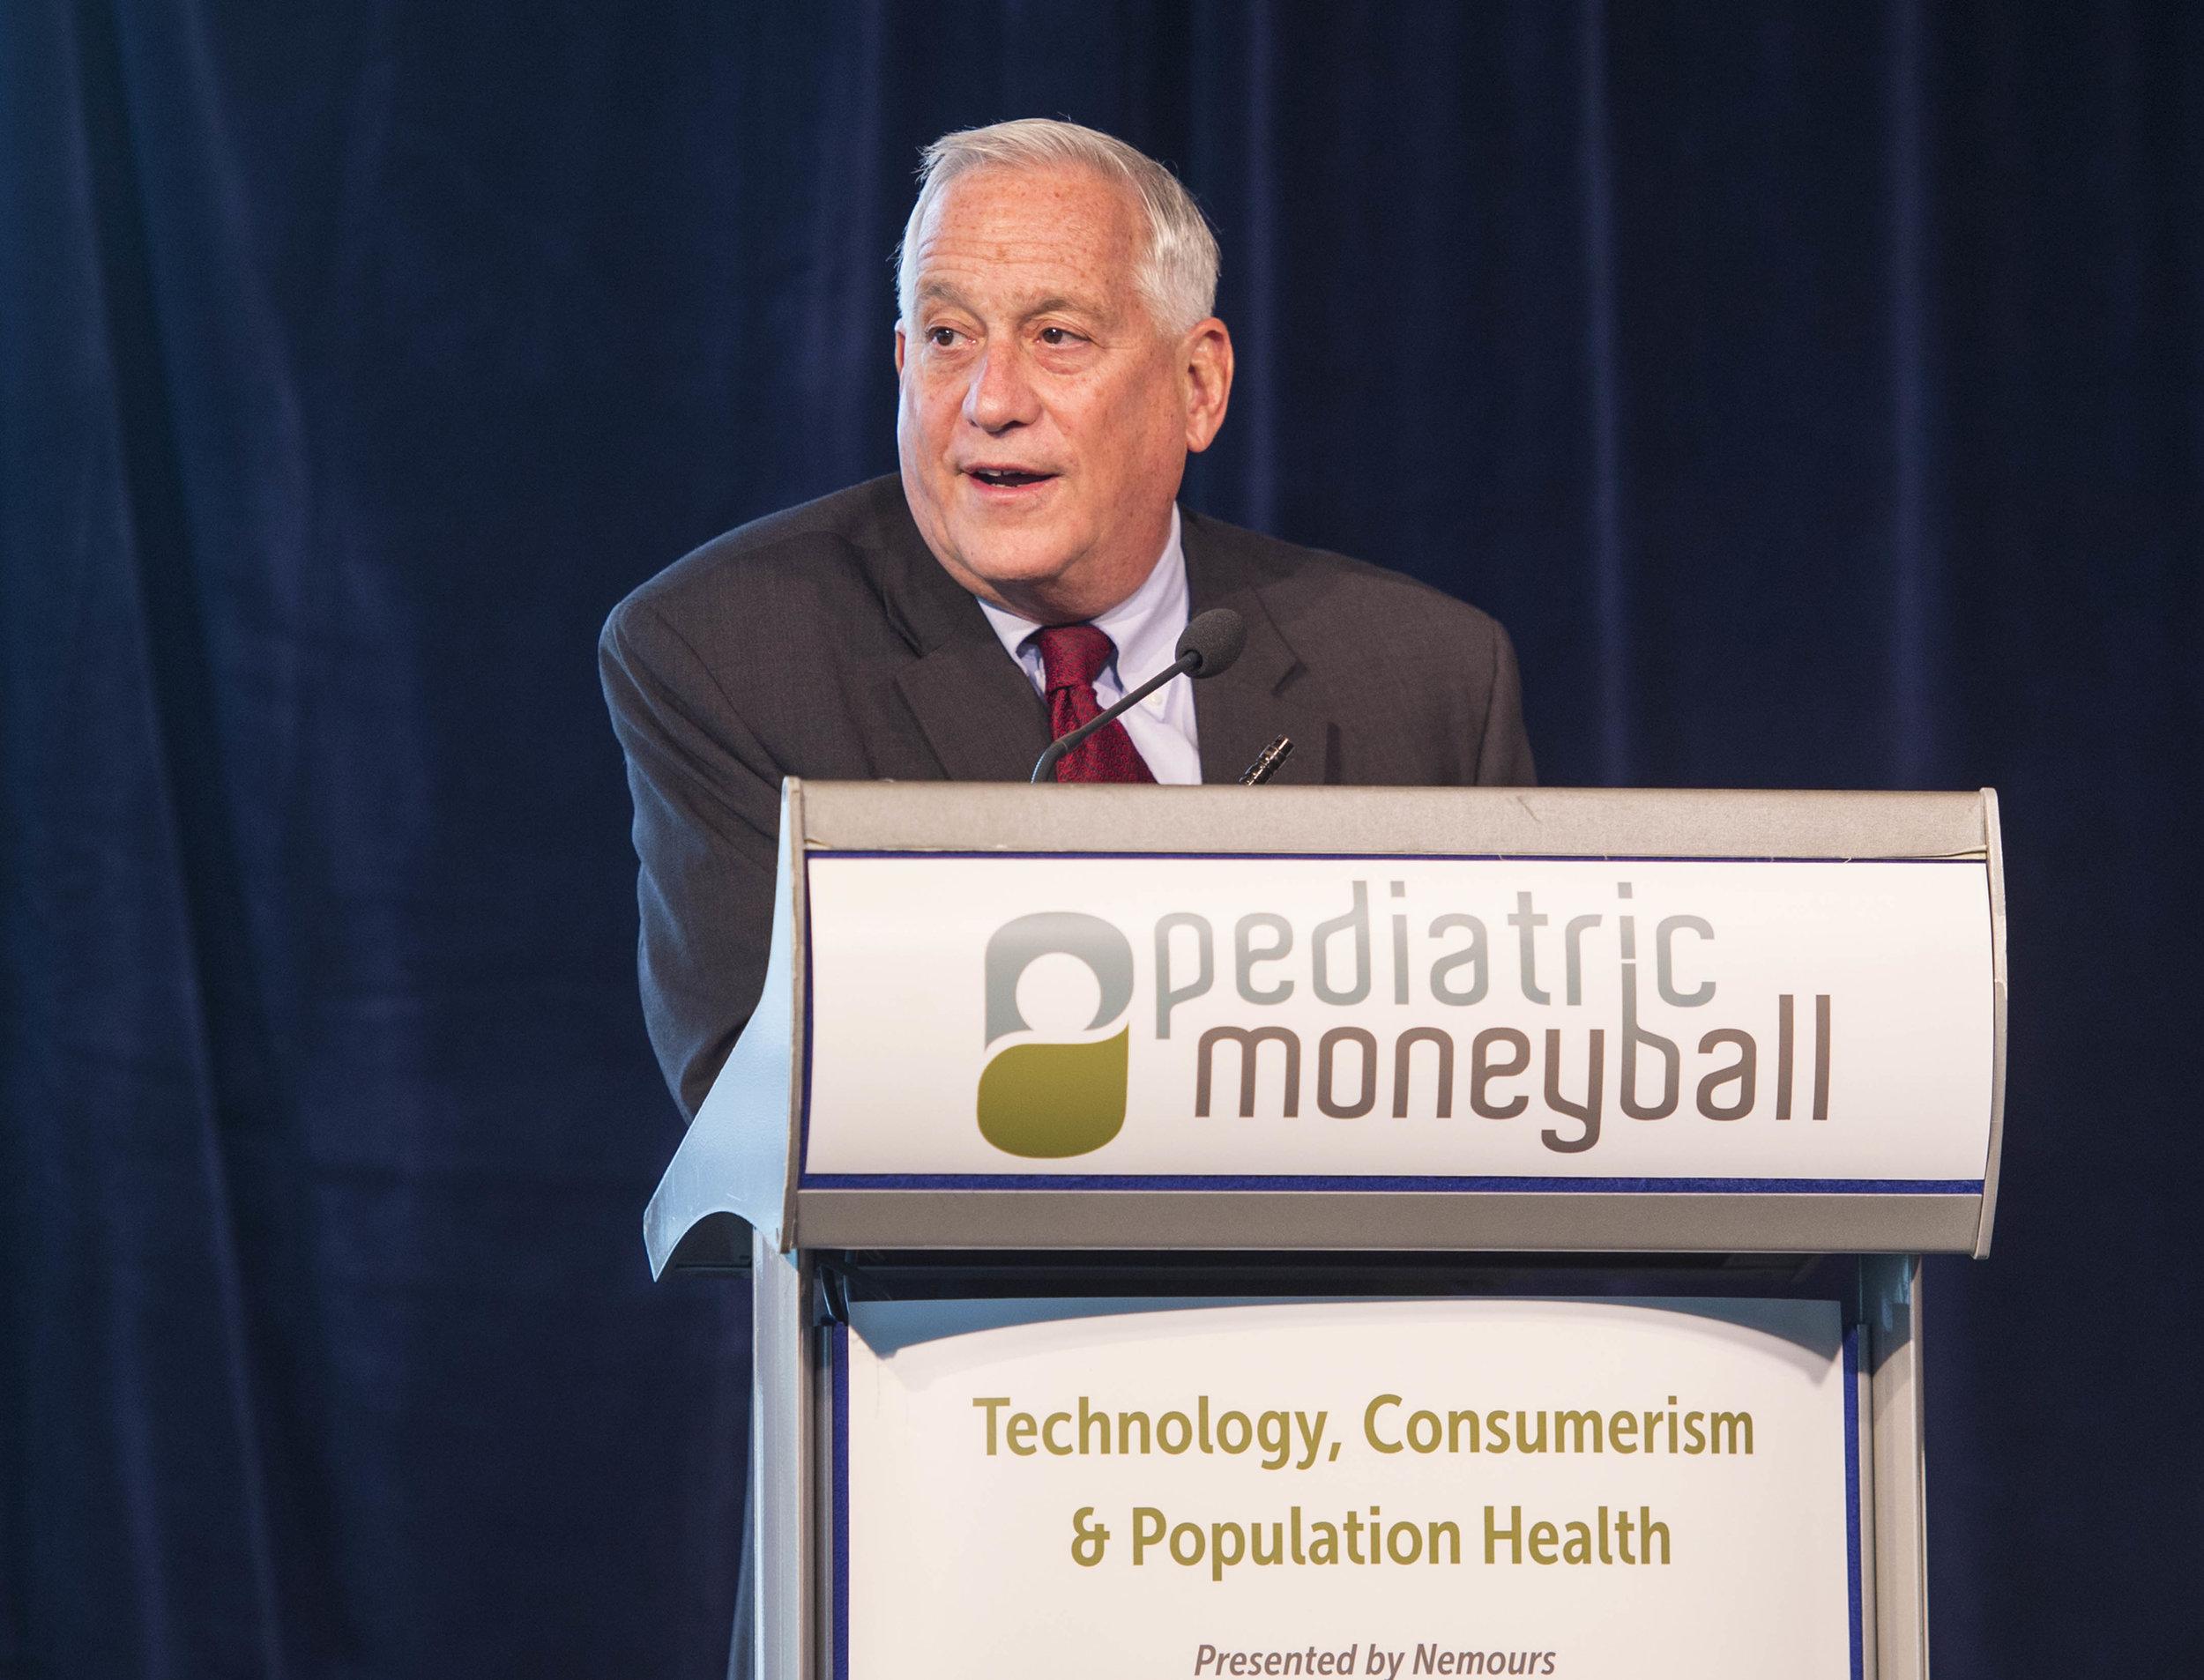 161-Pediatric MoneyBall-10.11.18.jpg